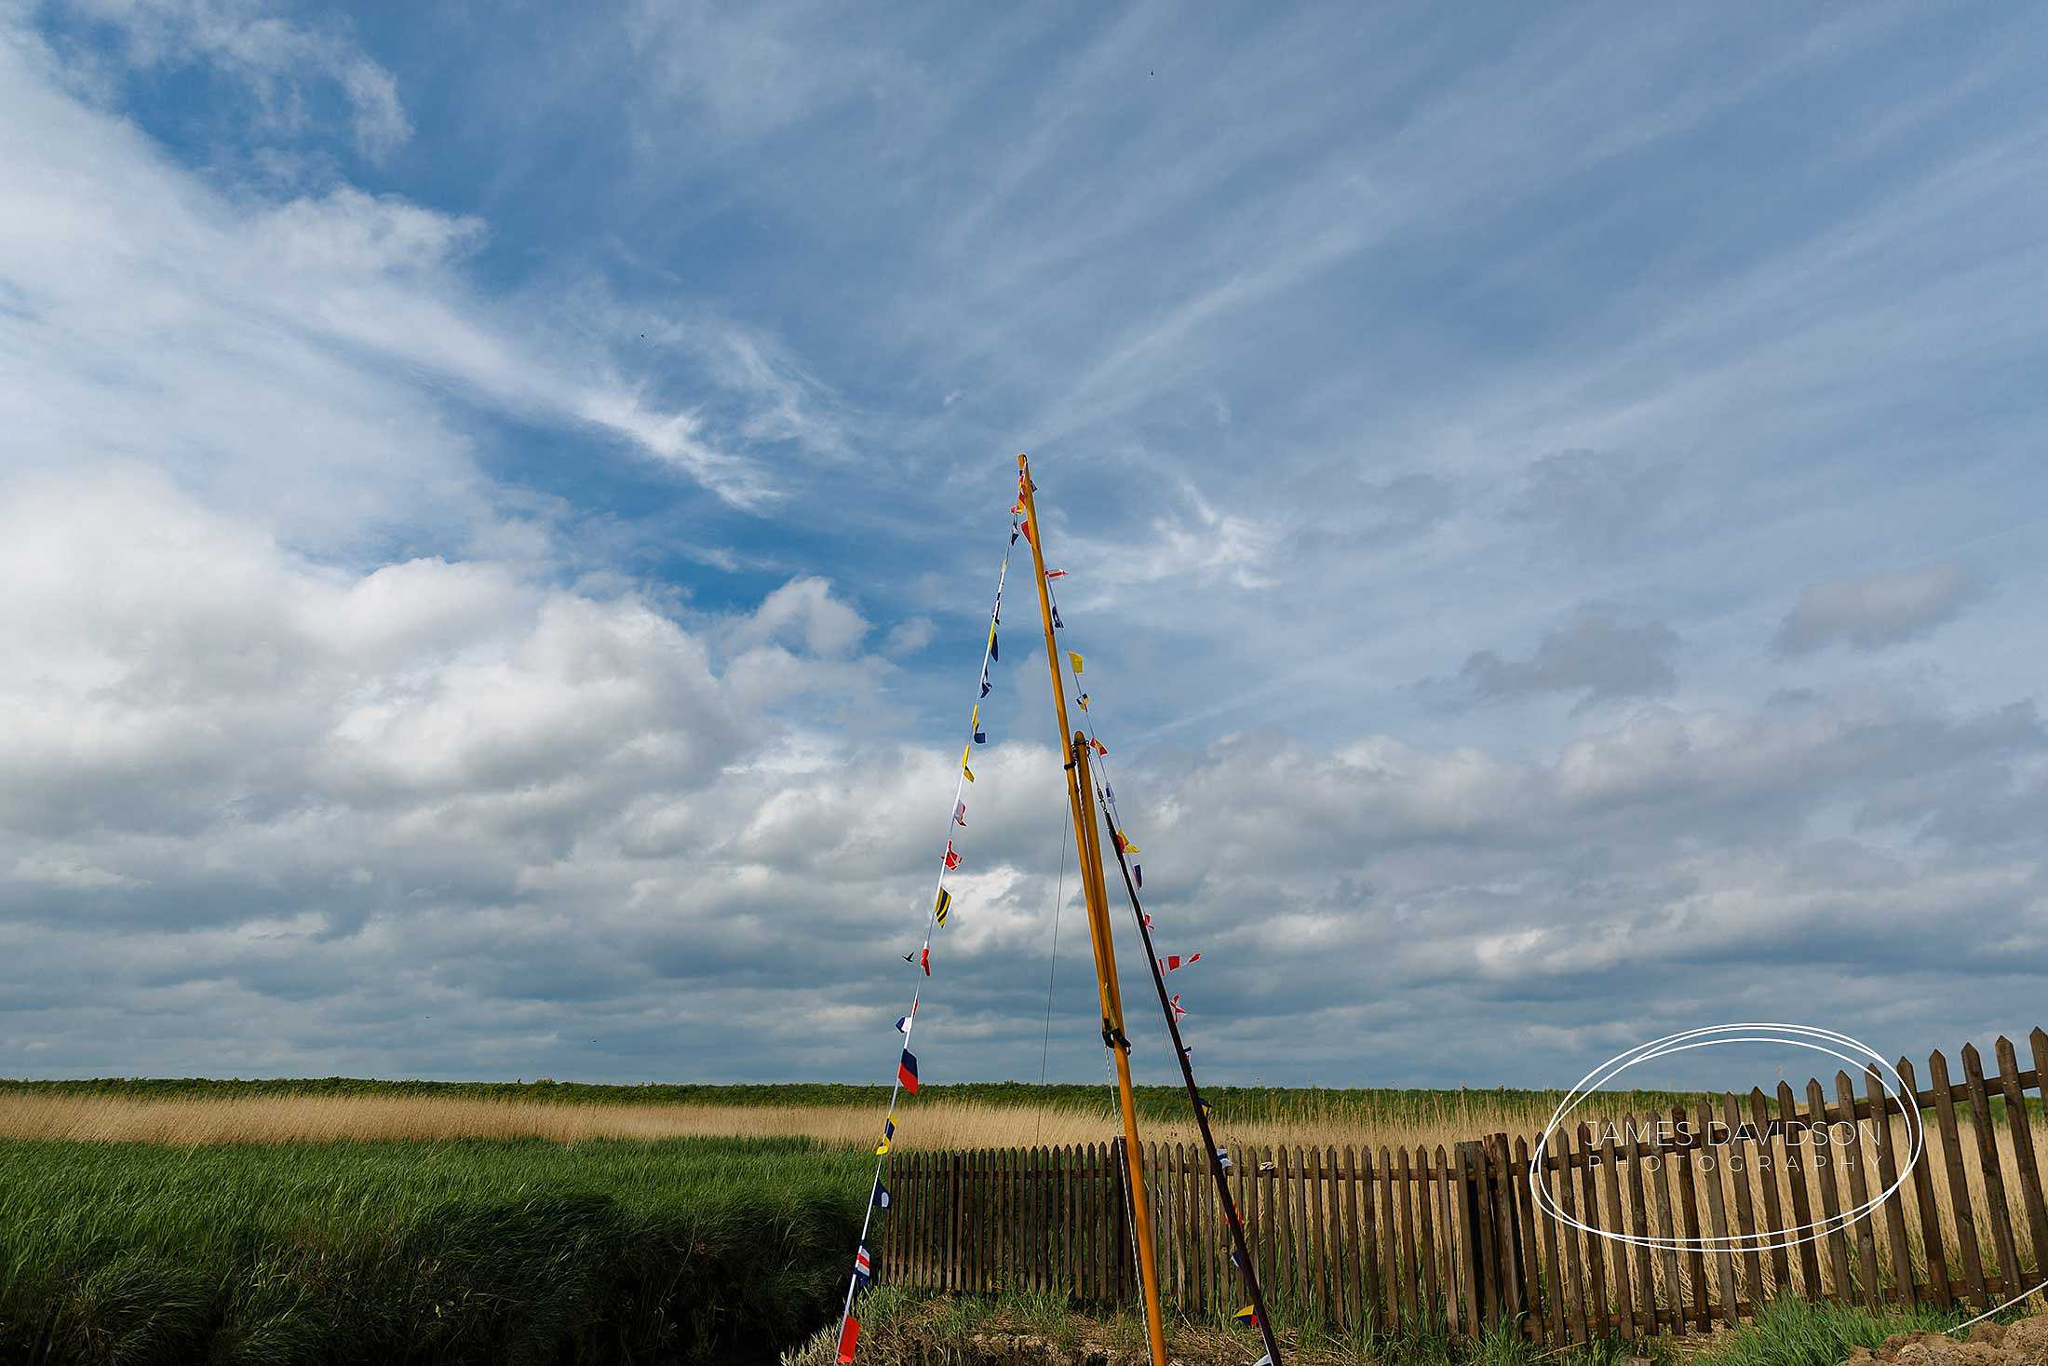 Cley windmill boat